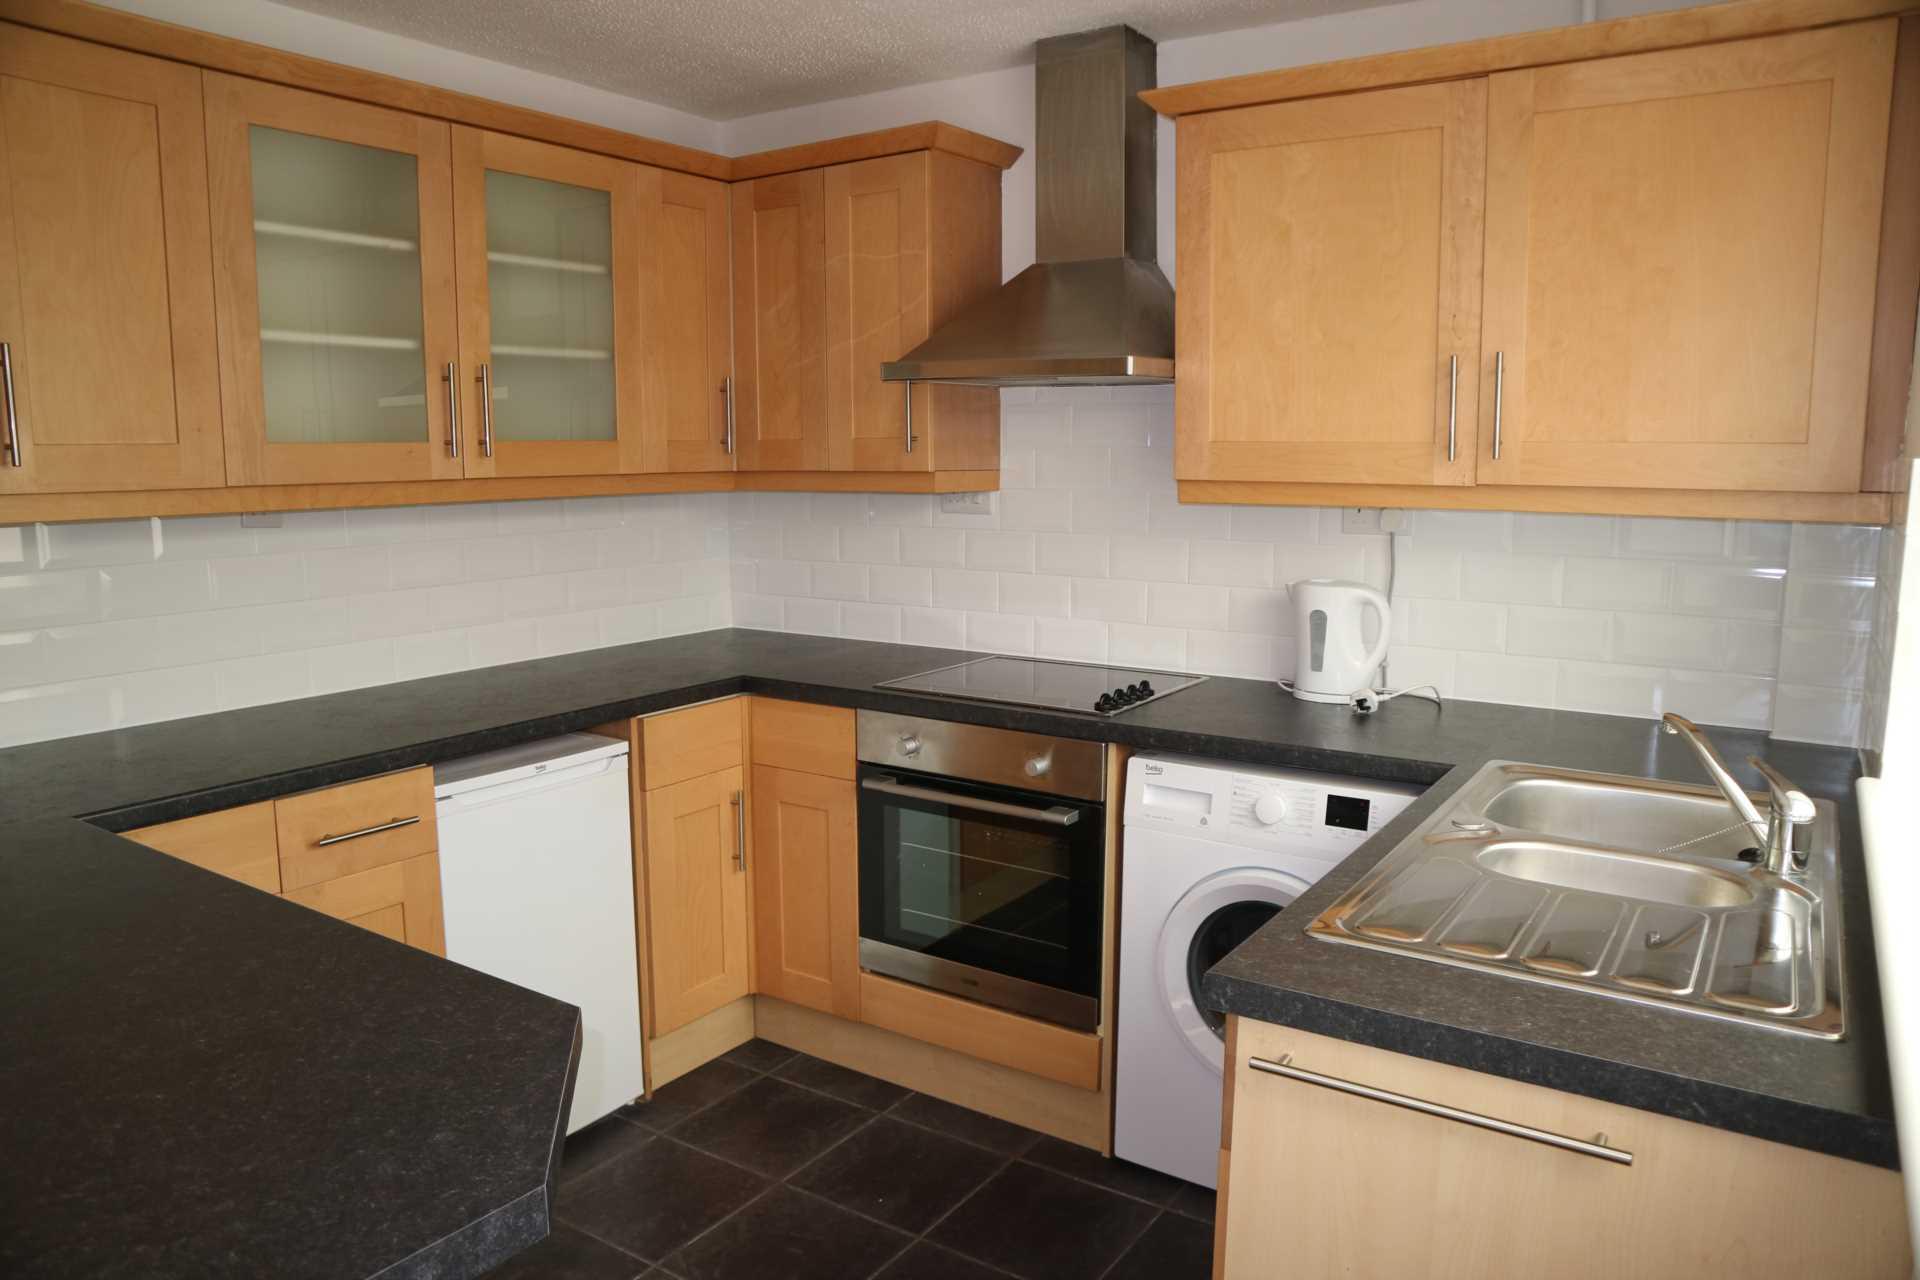 Haddington Close, Bletchley, Image 10